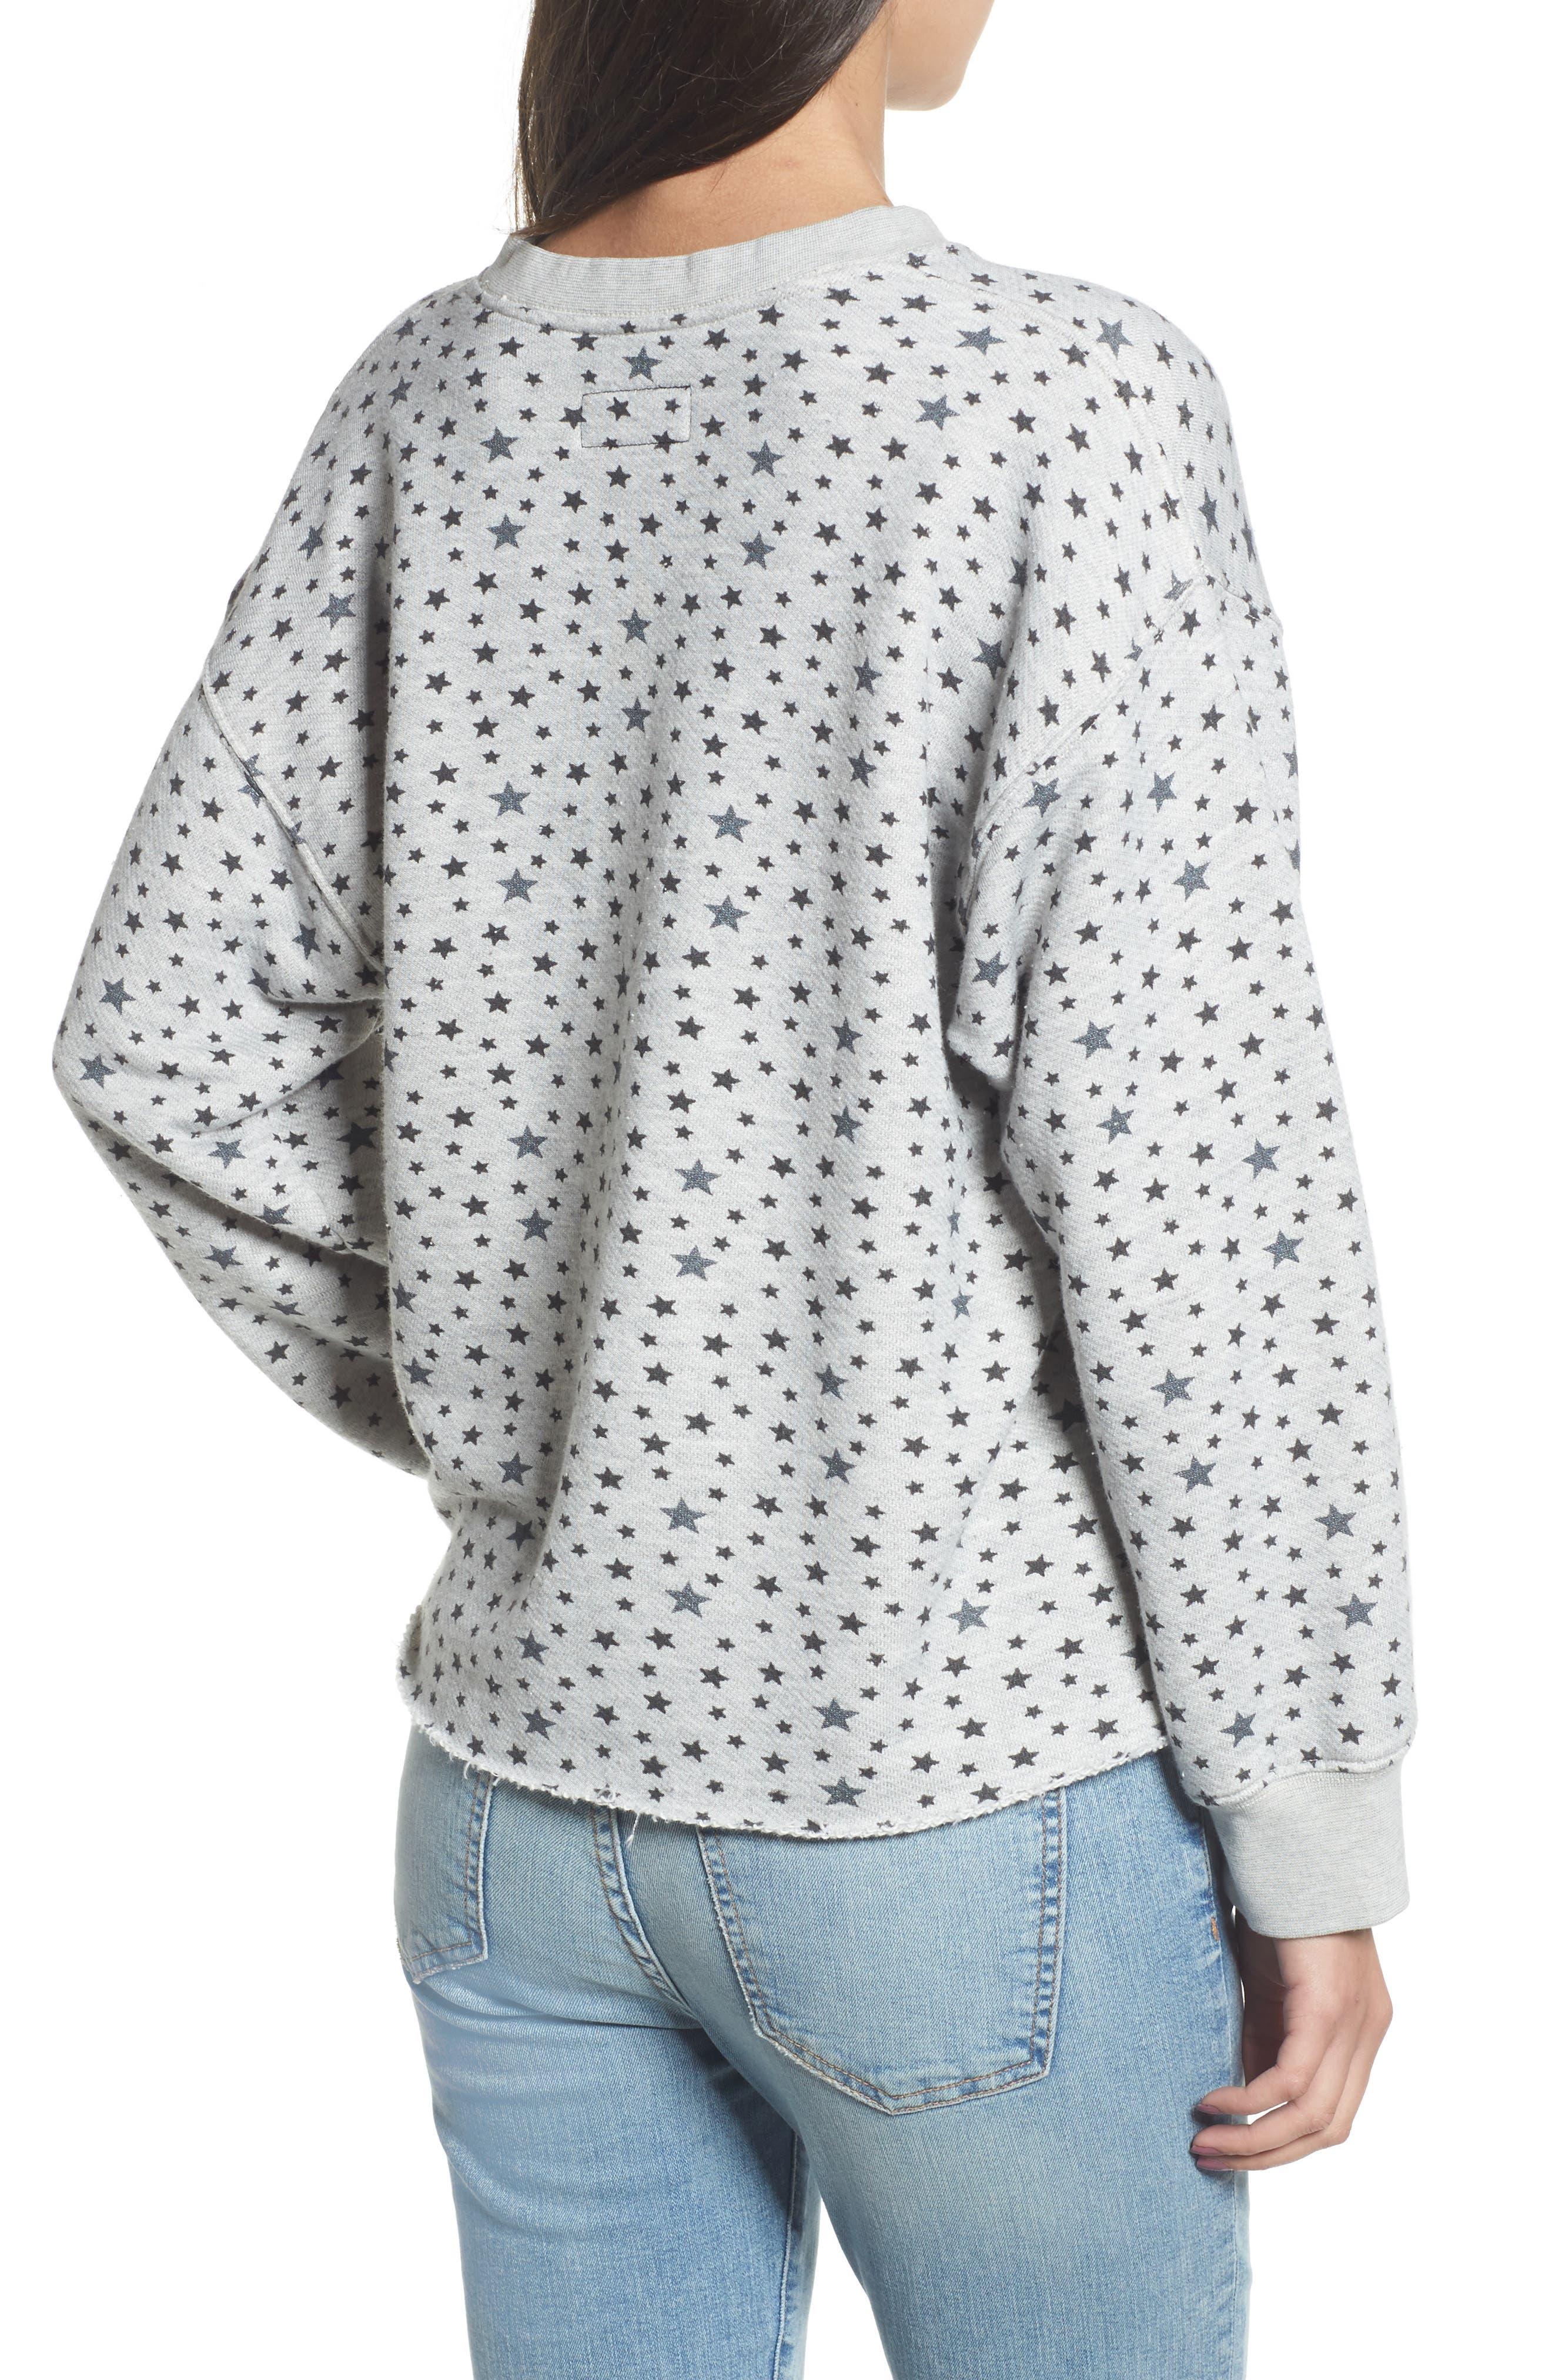 The Slouchy Crop Sweatshirt,                             Alternate thumbnail 2, color,                             Mixed Star Print